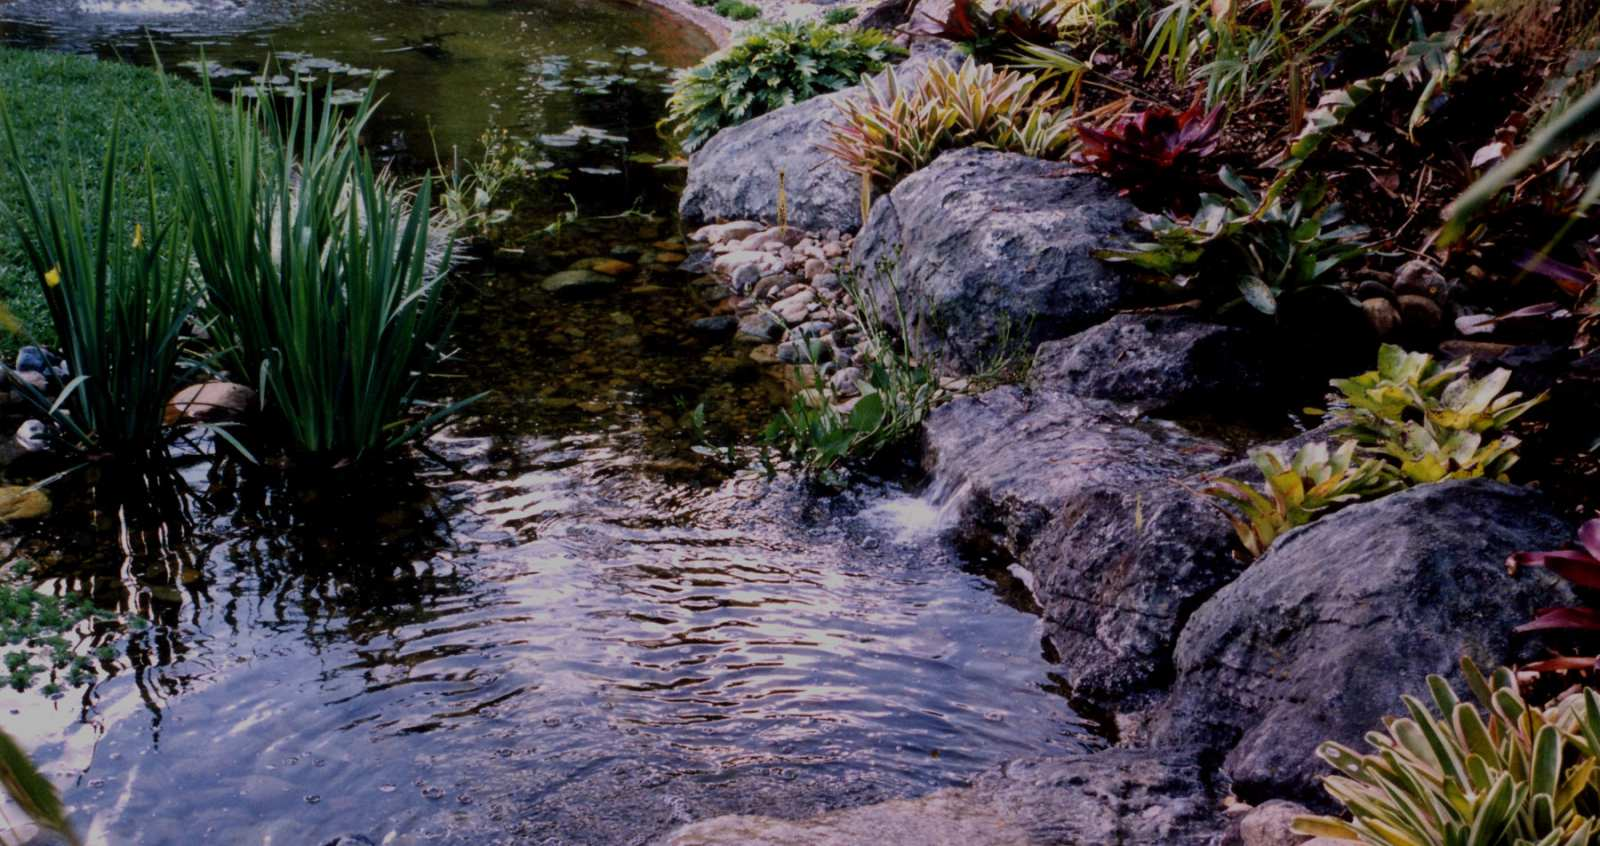 ArtificialRock-fake-garden-rock-ponds